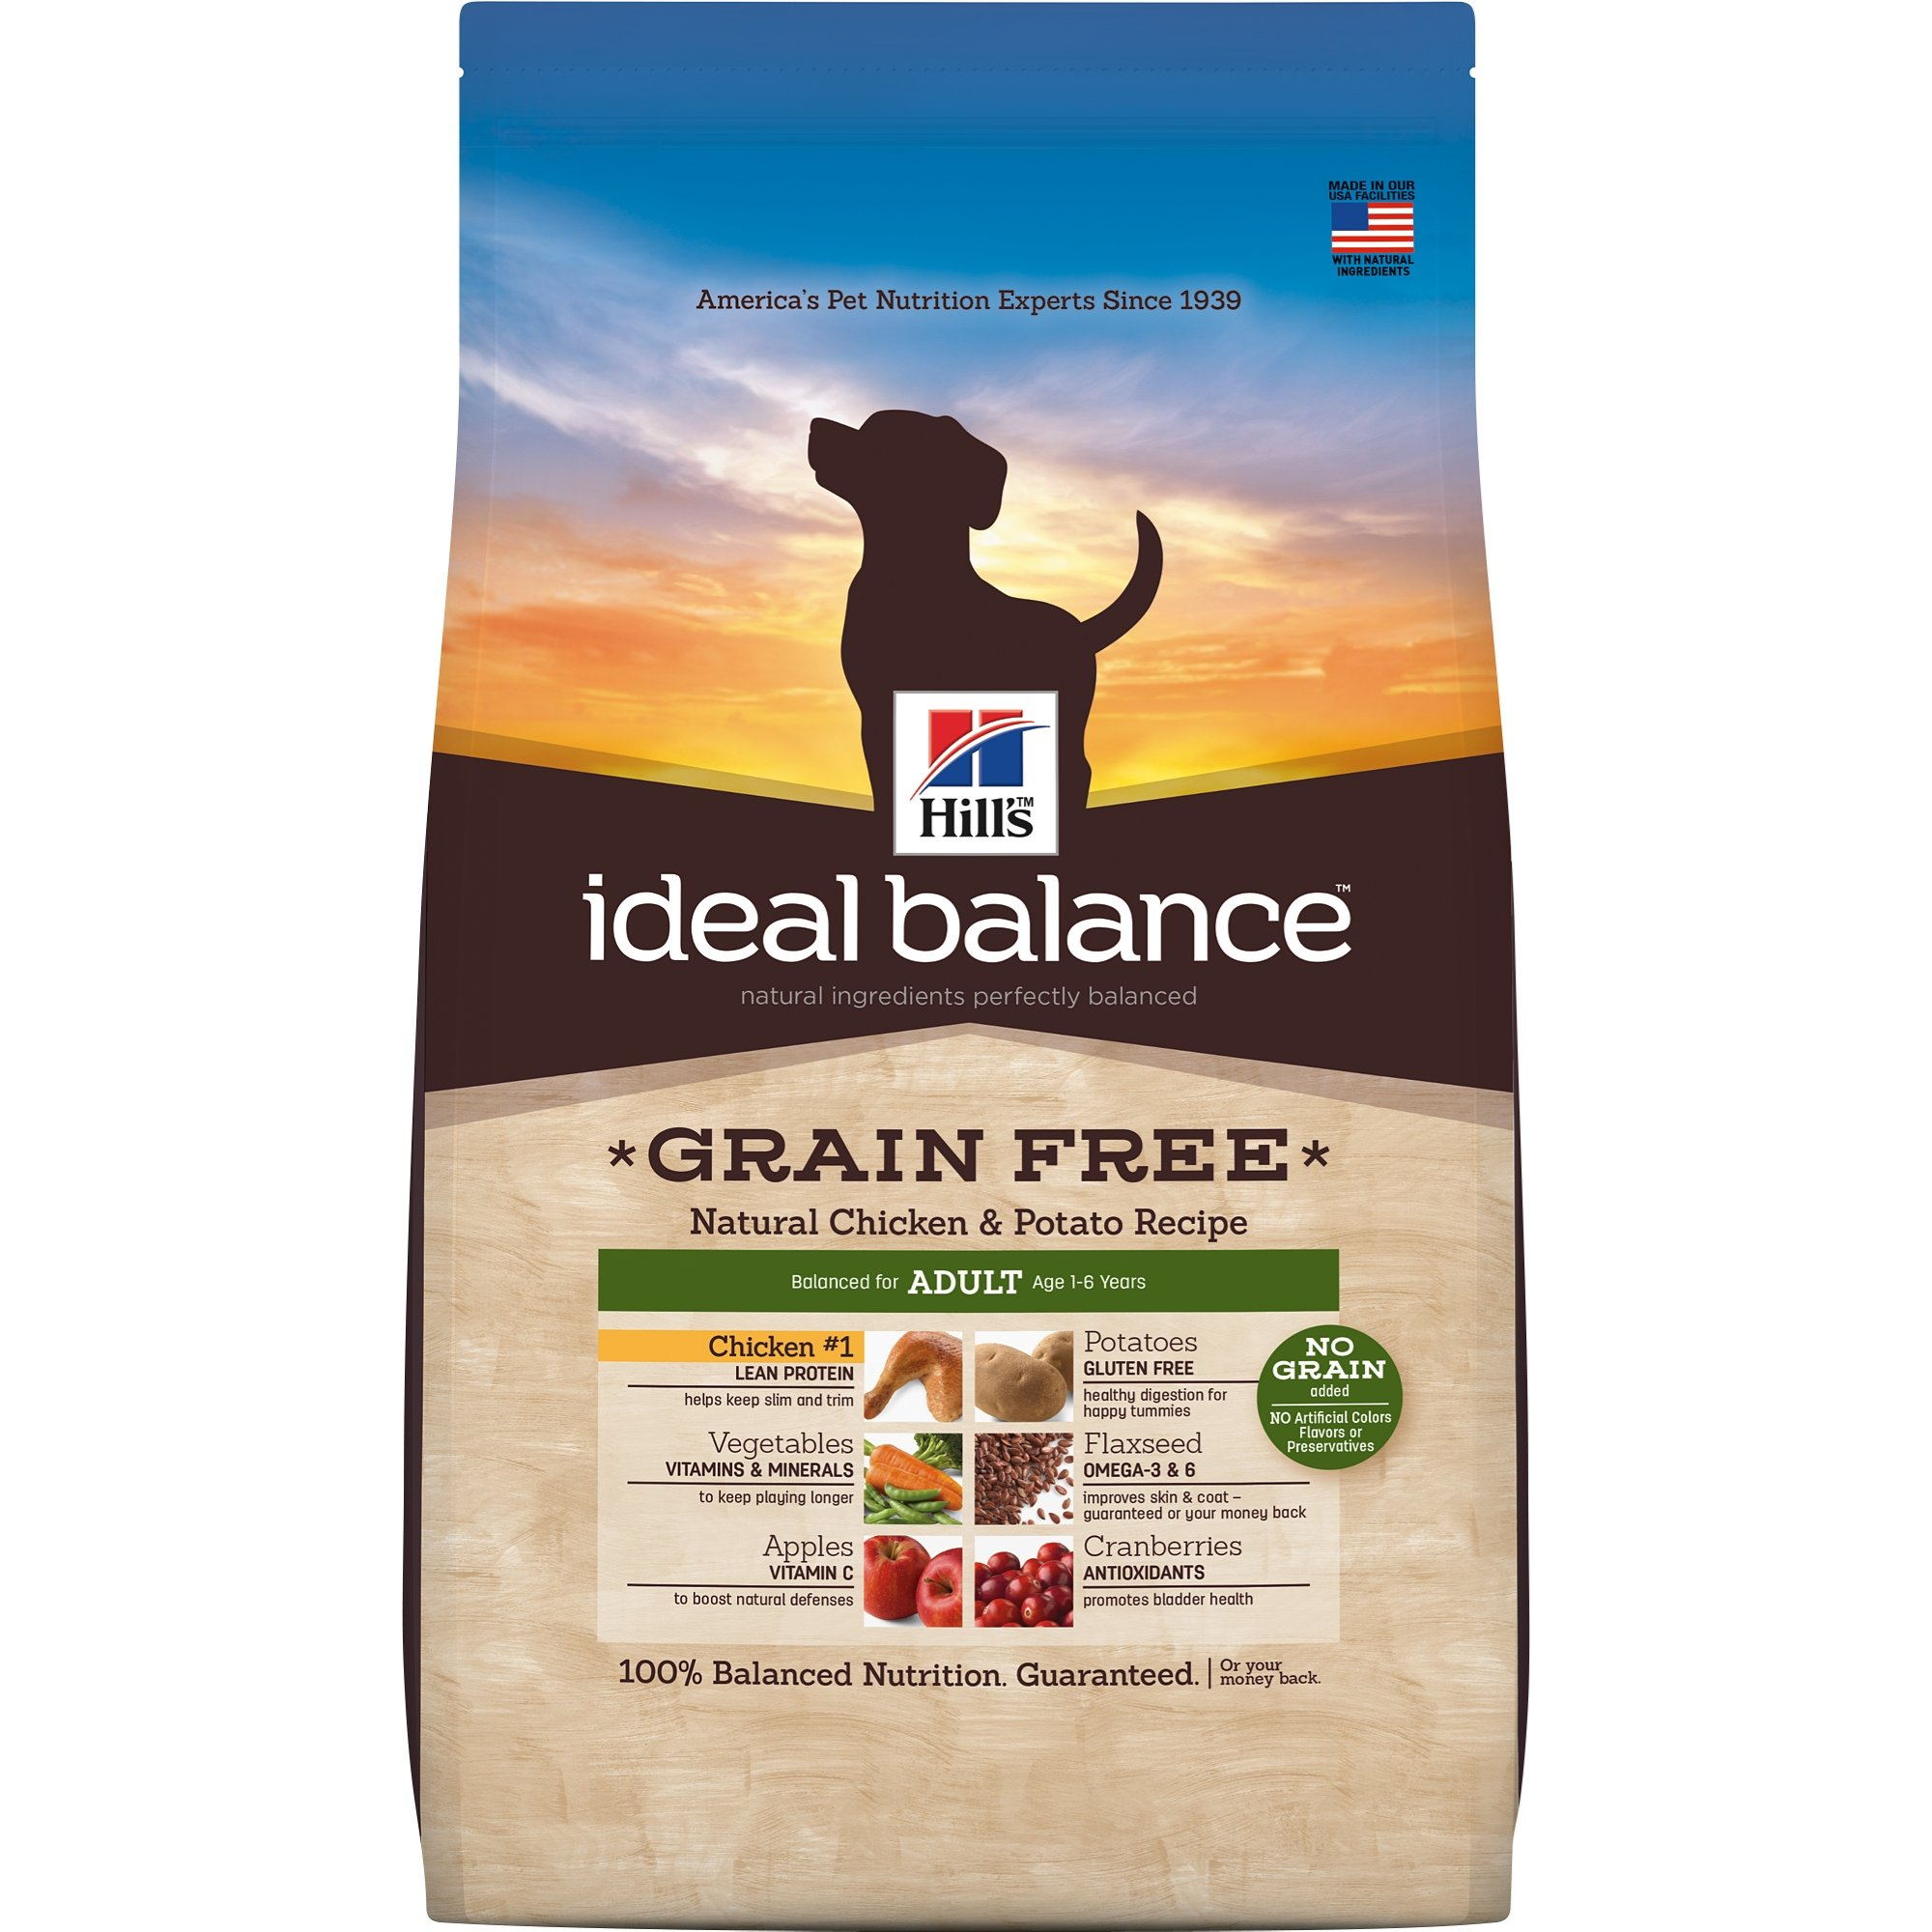 Hill's Ideal Balance Grain Free Adult Dog Dry Food Bag